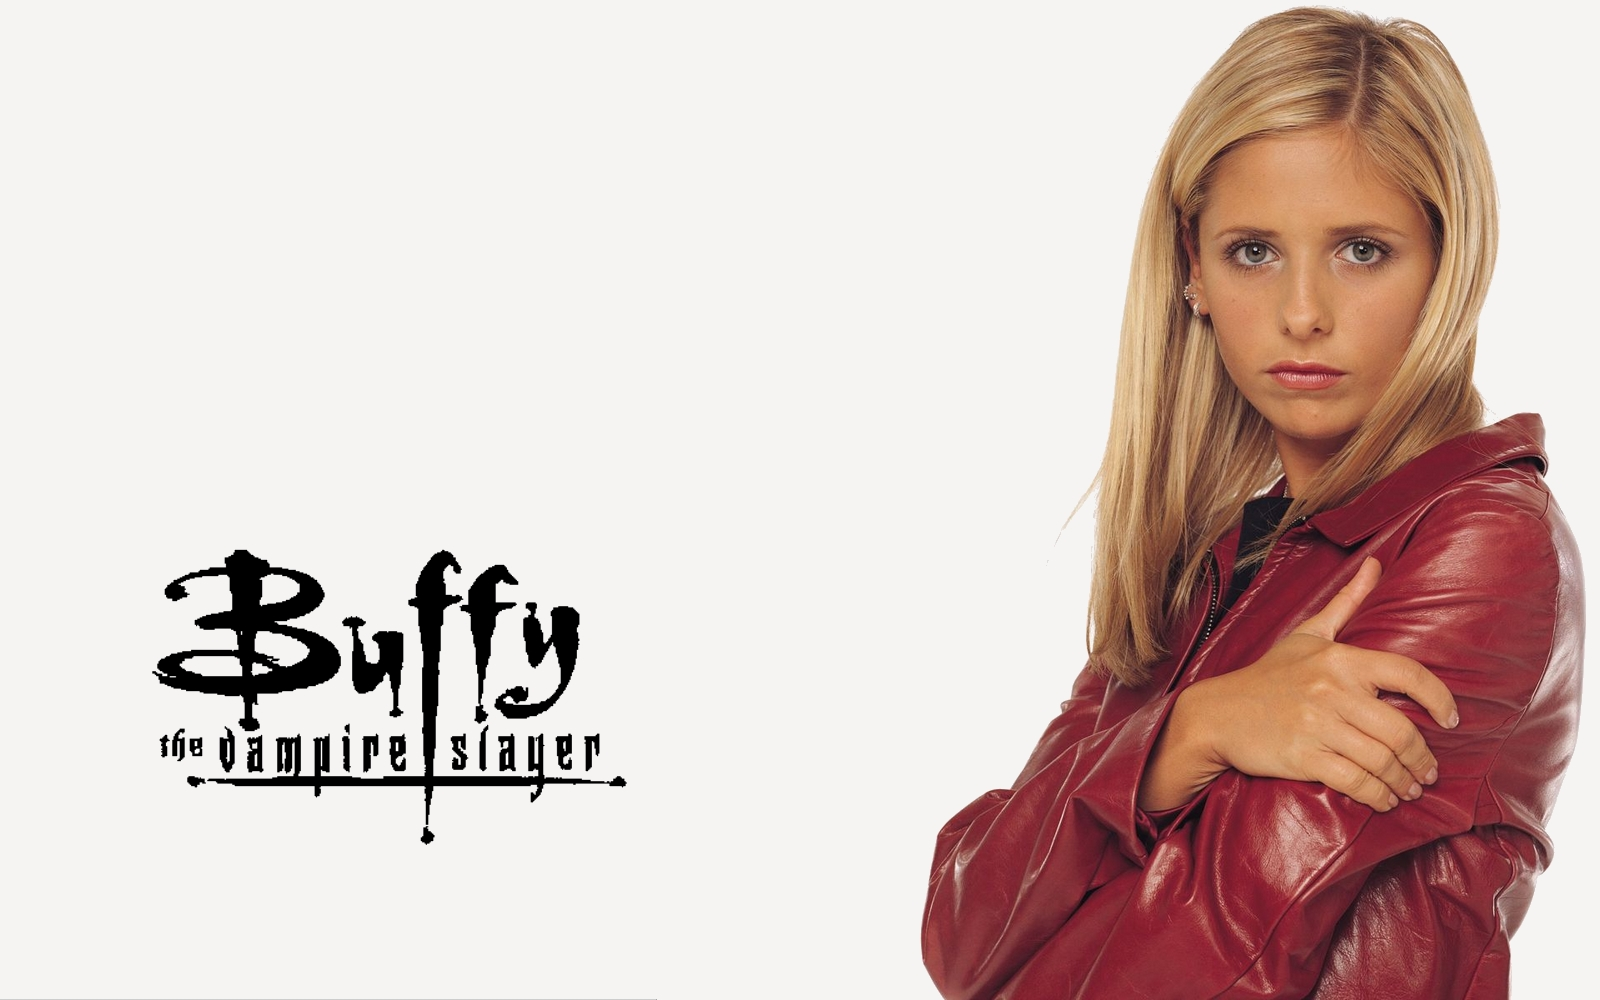 Wallpaperboard 01 Buffy The Vampire Slayer Wallpaper